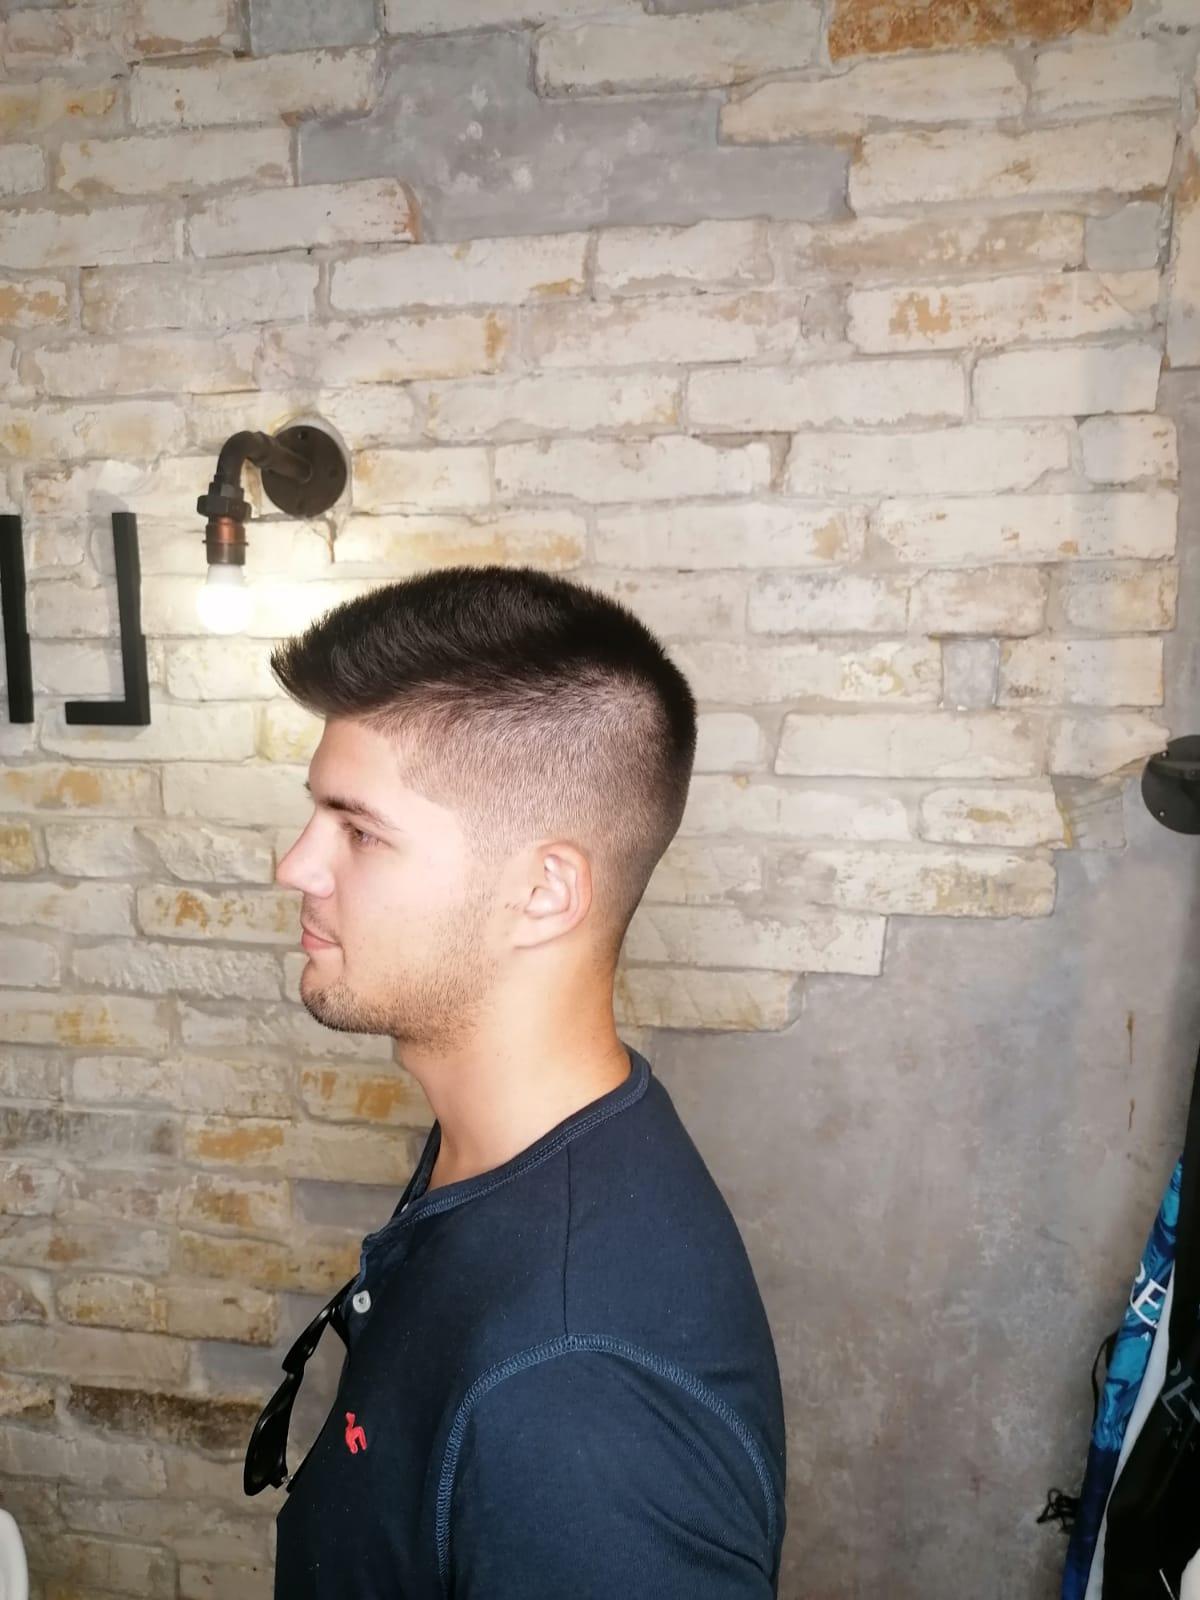 Barber hajvágás